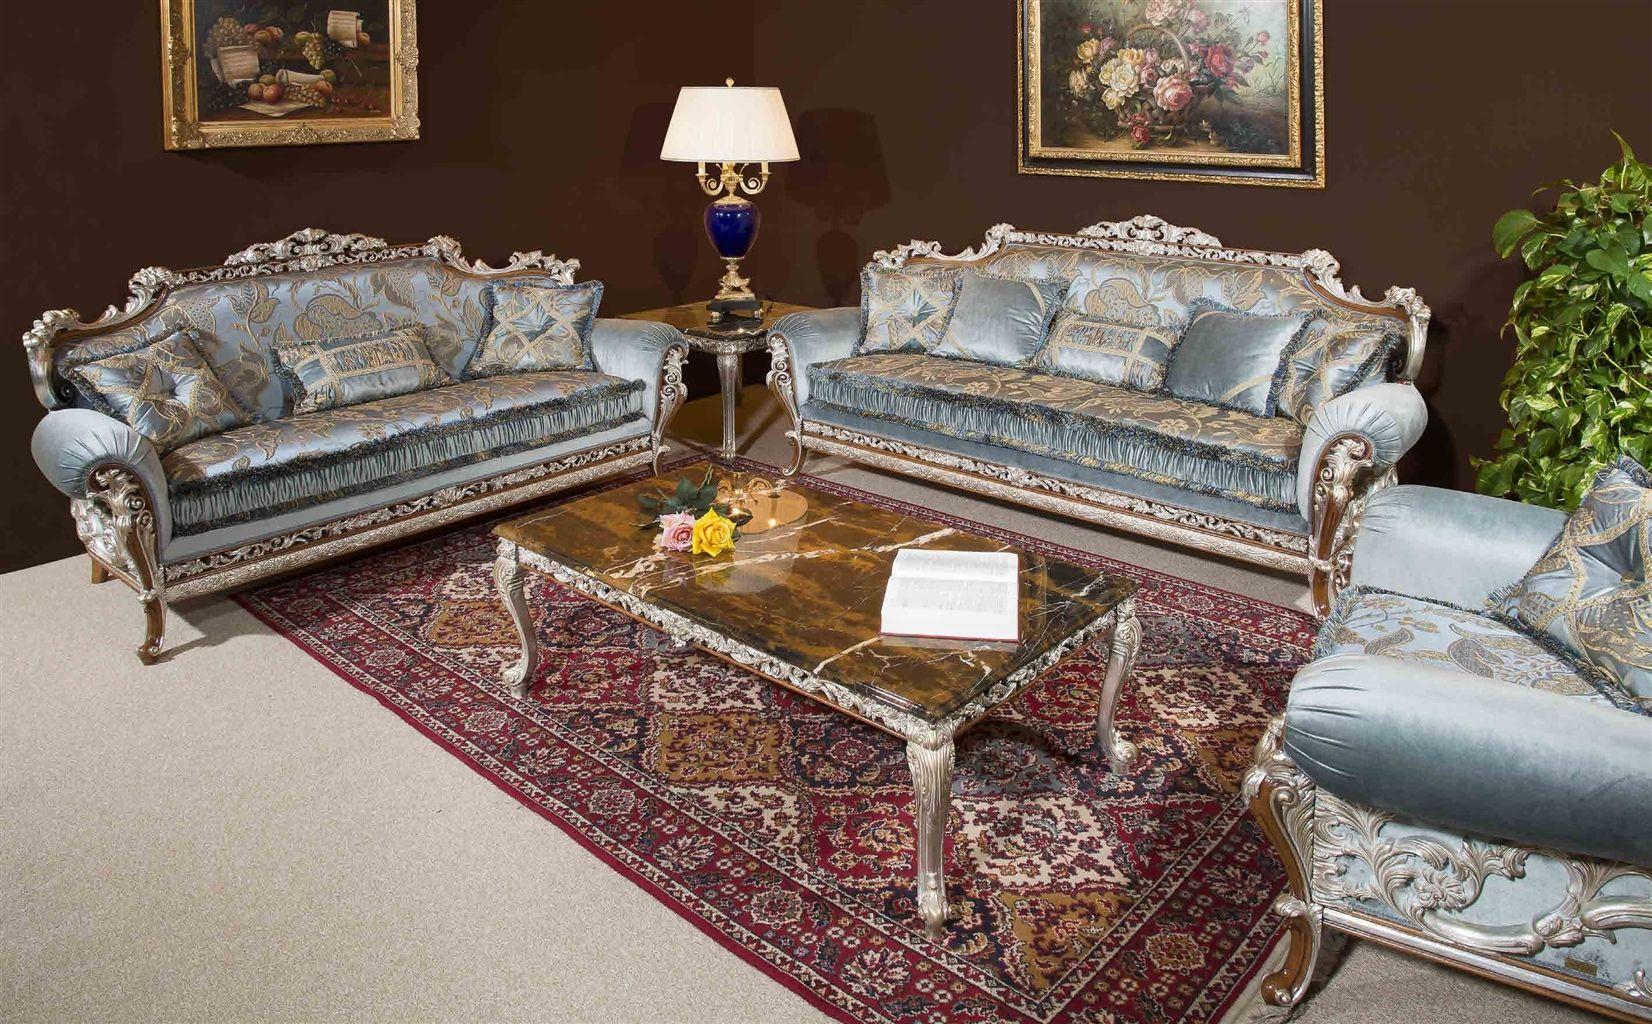 Baby Blue Sofa And Arm Chair Handmade In Europe Blue Sofa Luxury Living Room Decor Armchair